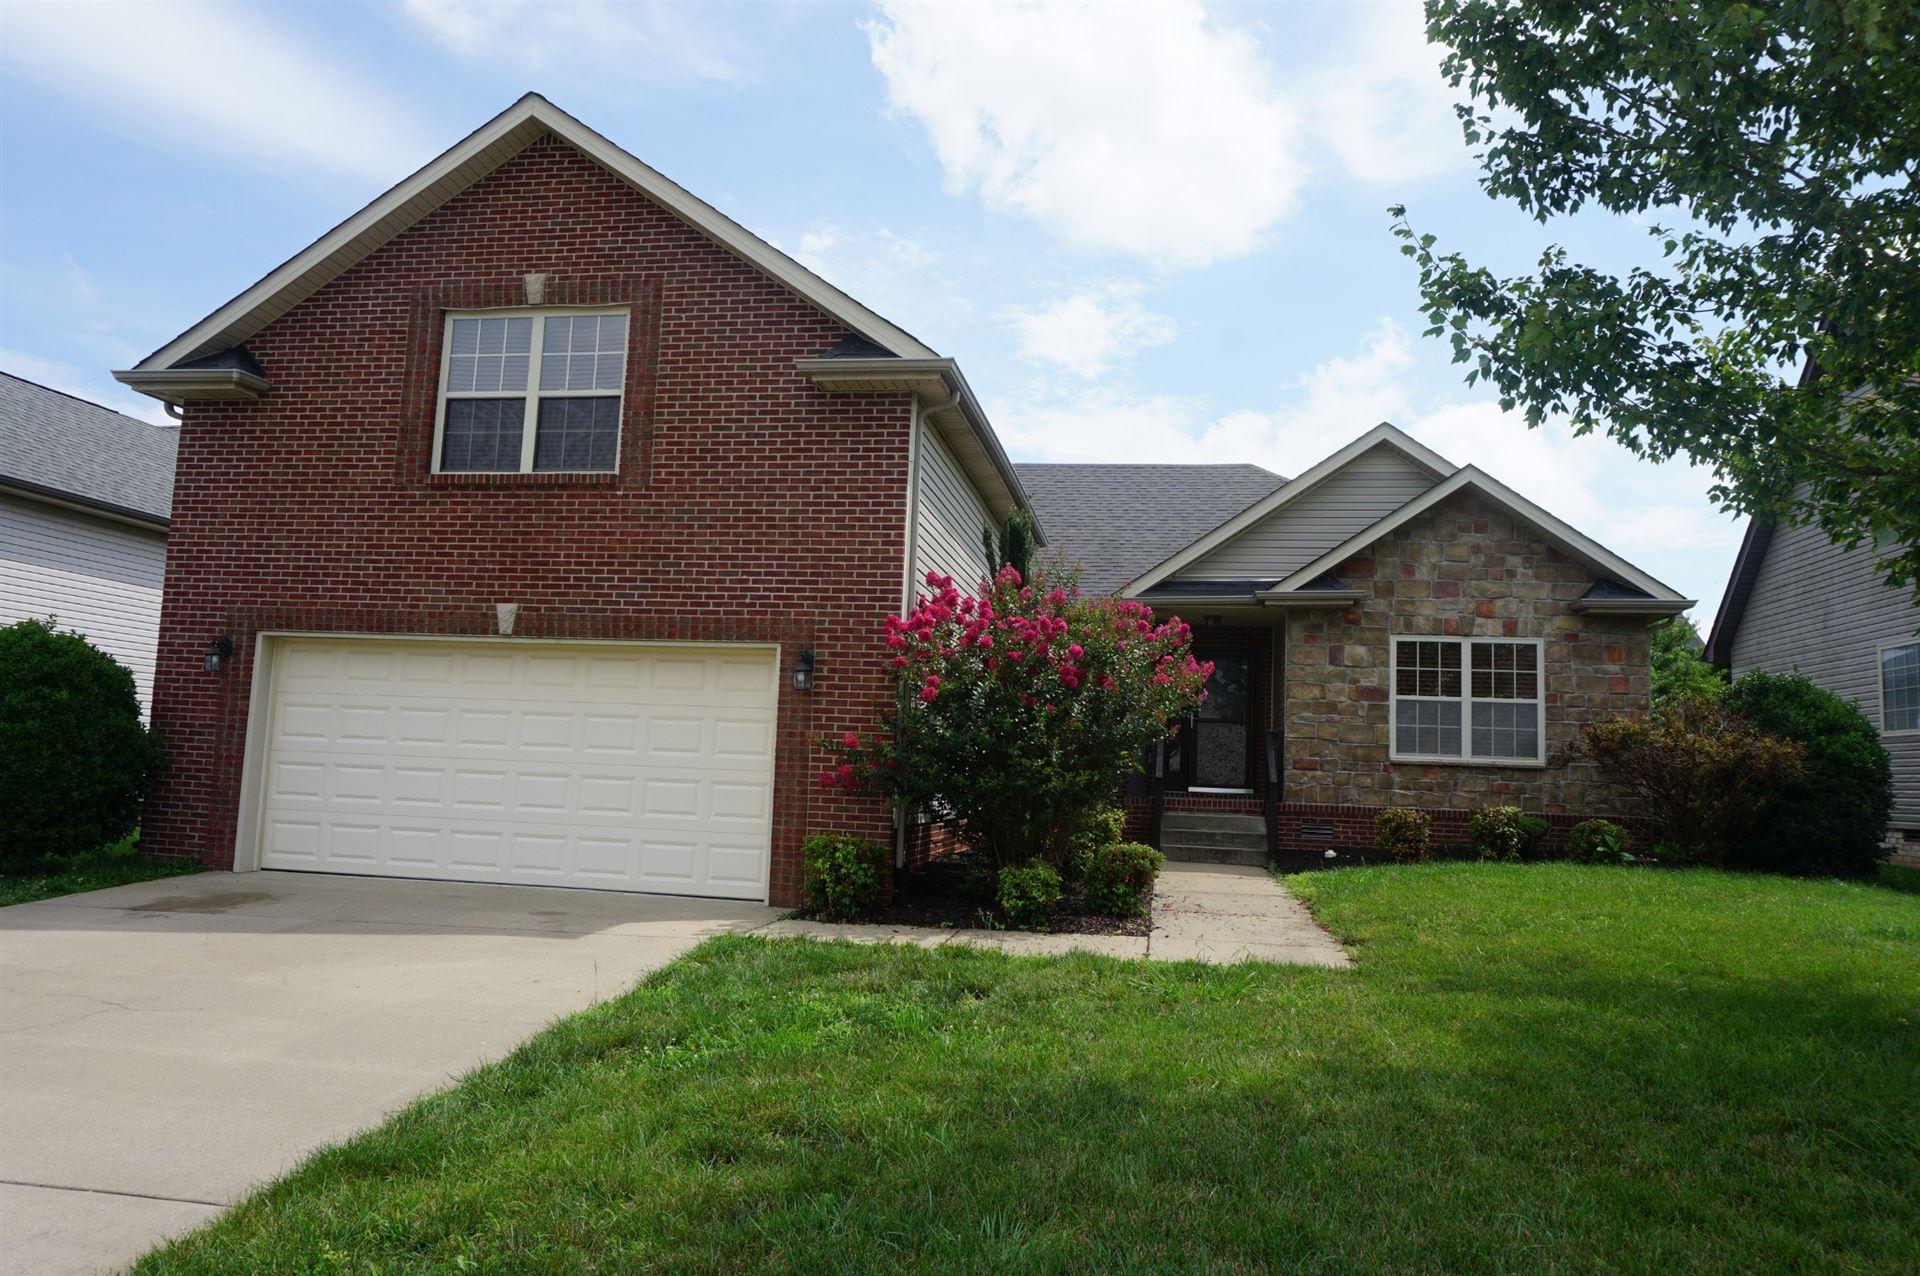 3361 Franklin Meadows Way, Clarksville, TN 37042 - MLS#: 2275244